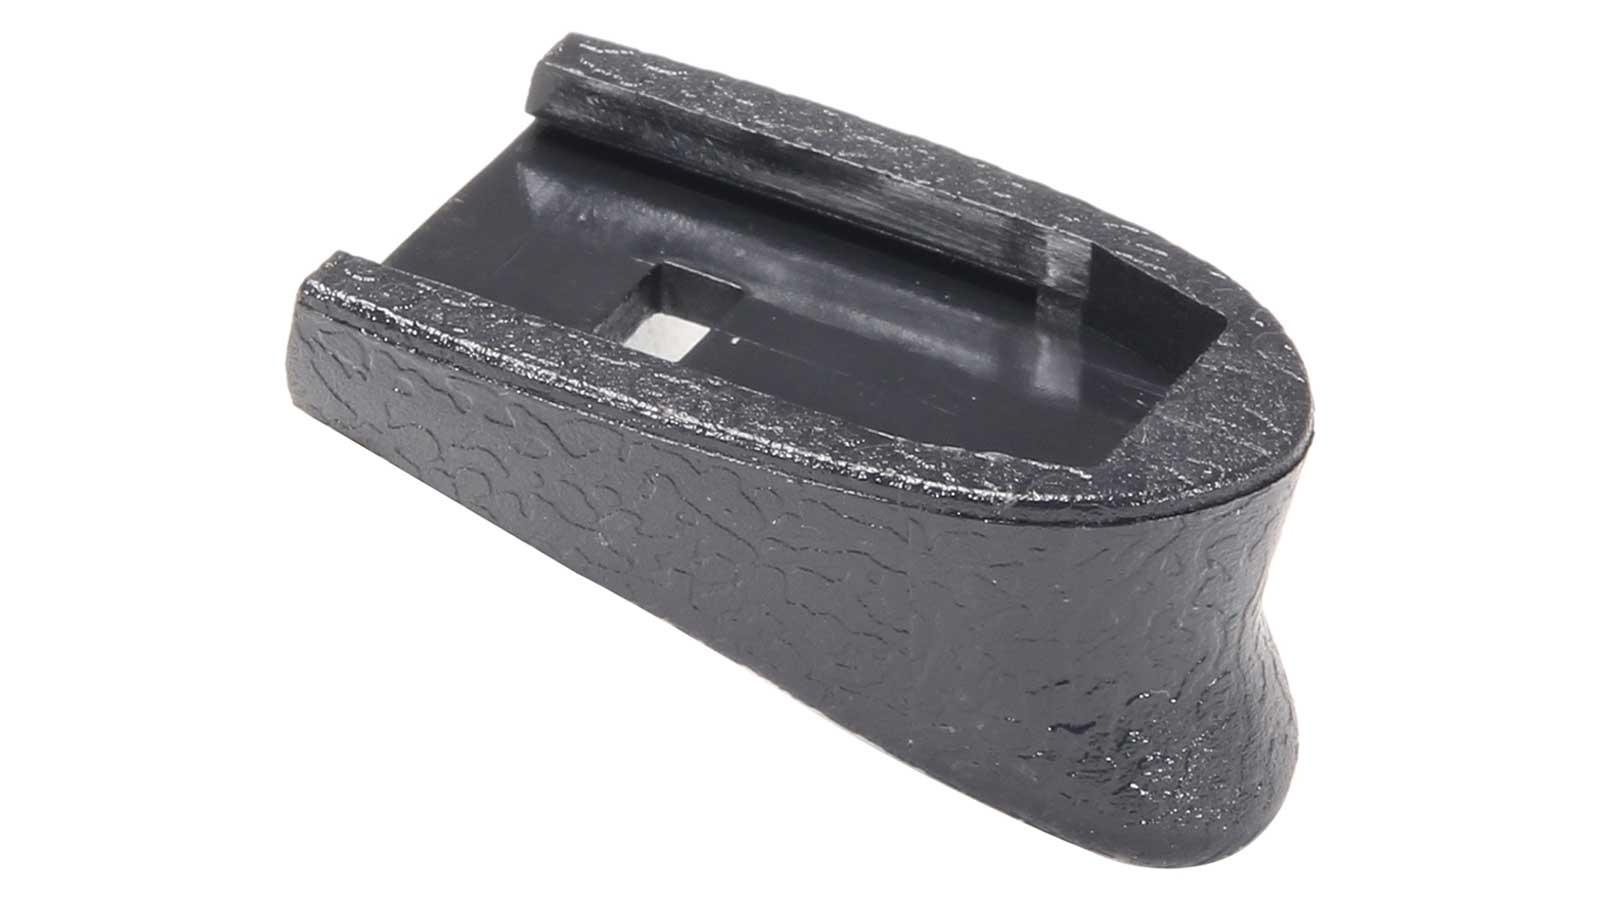 Pachmayr 03887 Grip Extender S&W Shield 9 Polymer Black Finish